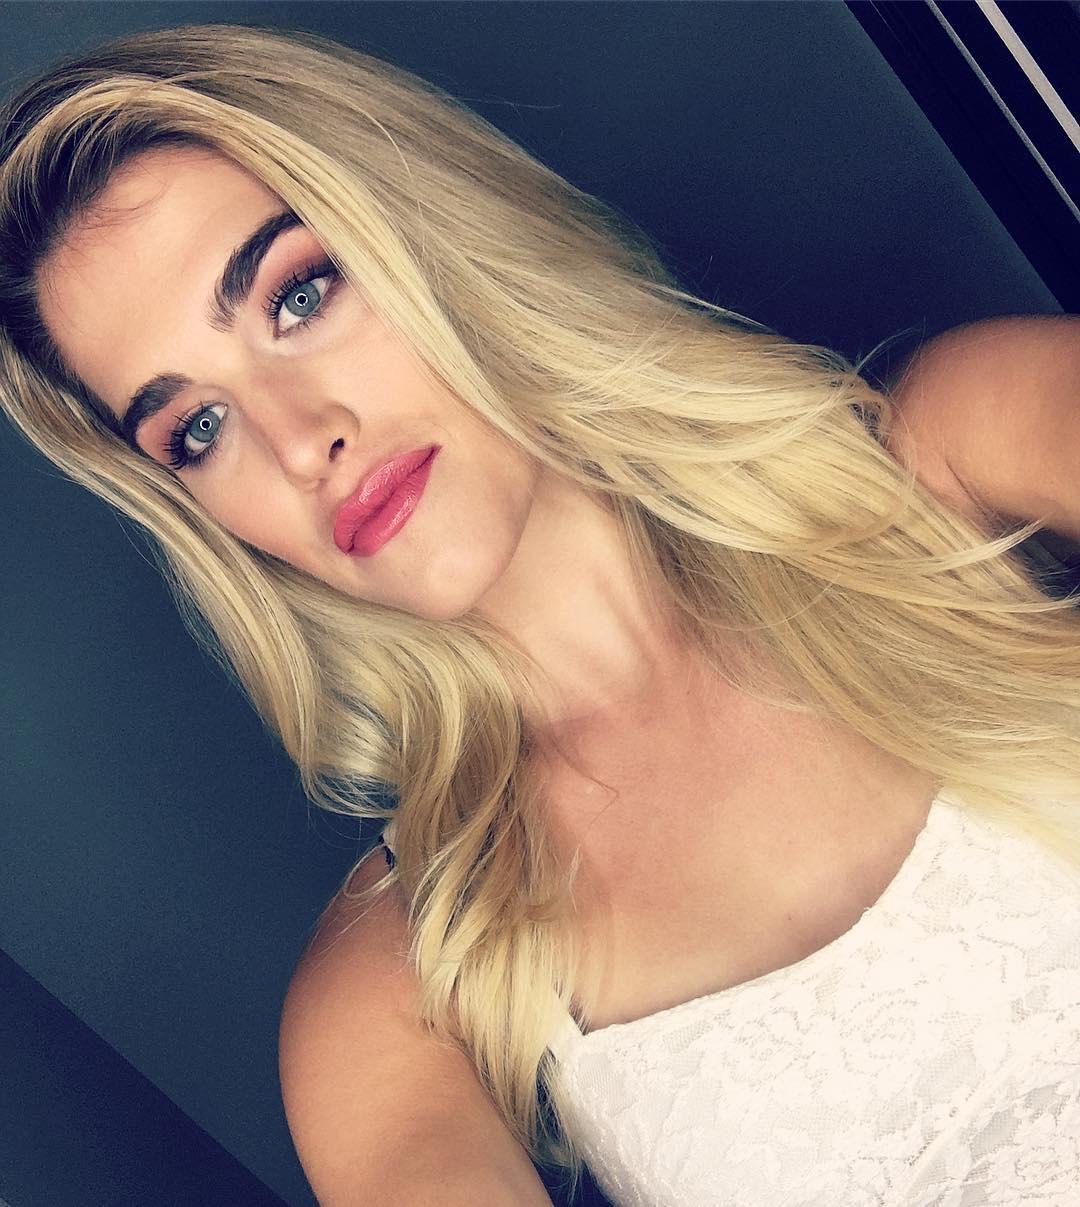 teresa calleja palazuelo, candidata a miss universe spain 2019/miss supranational spain 2018. 34049111